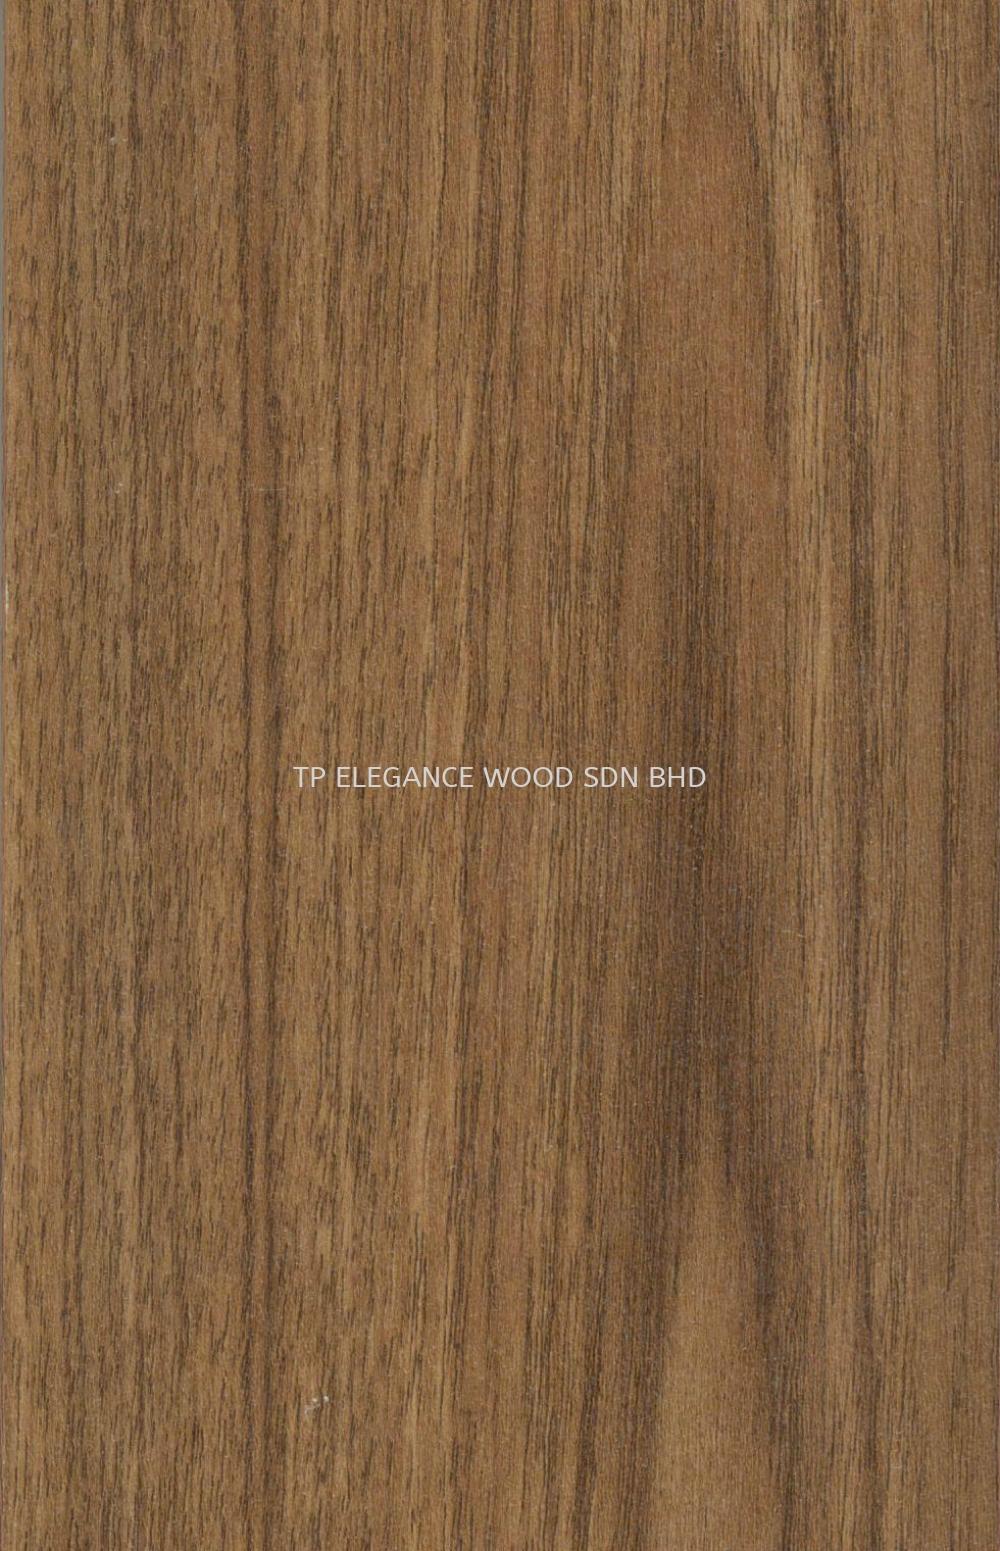 8205 8mm Laminate Flooring Thk Johor Bahru Jb Malaysia Singapore Supply Supplier Tp Elegance Wood Sdn Bhd